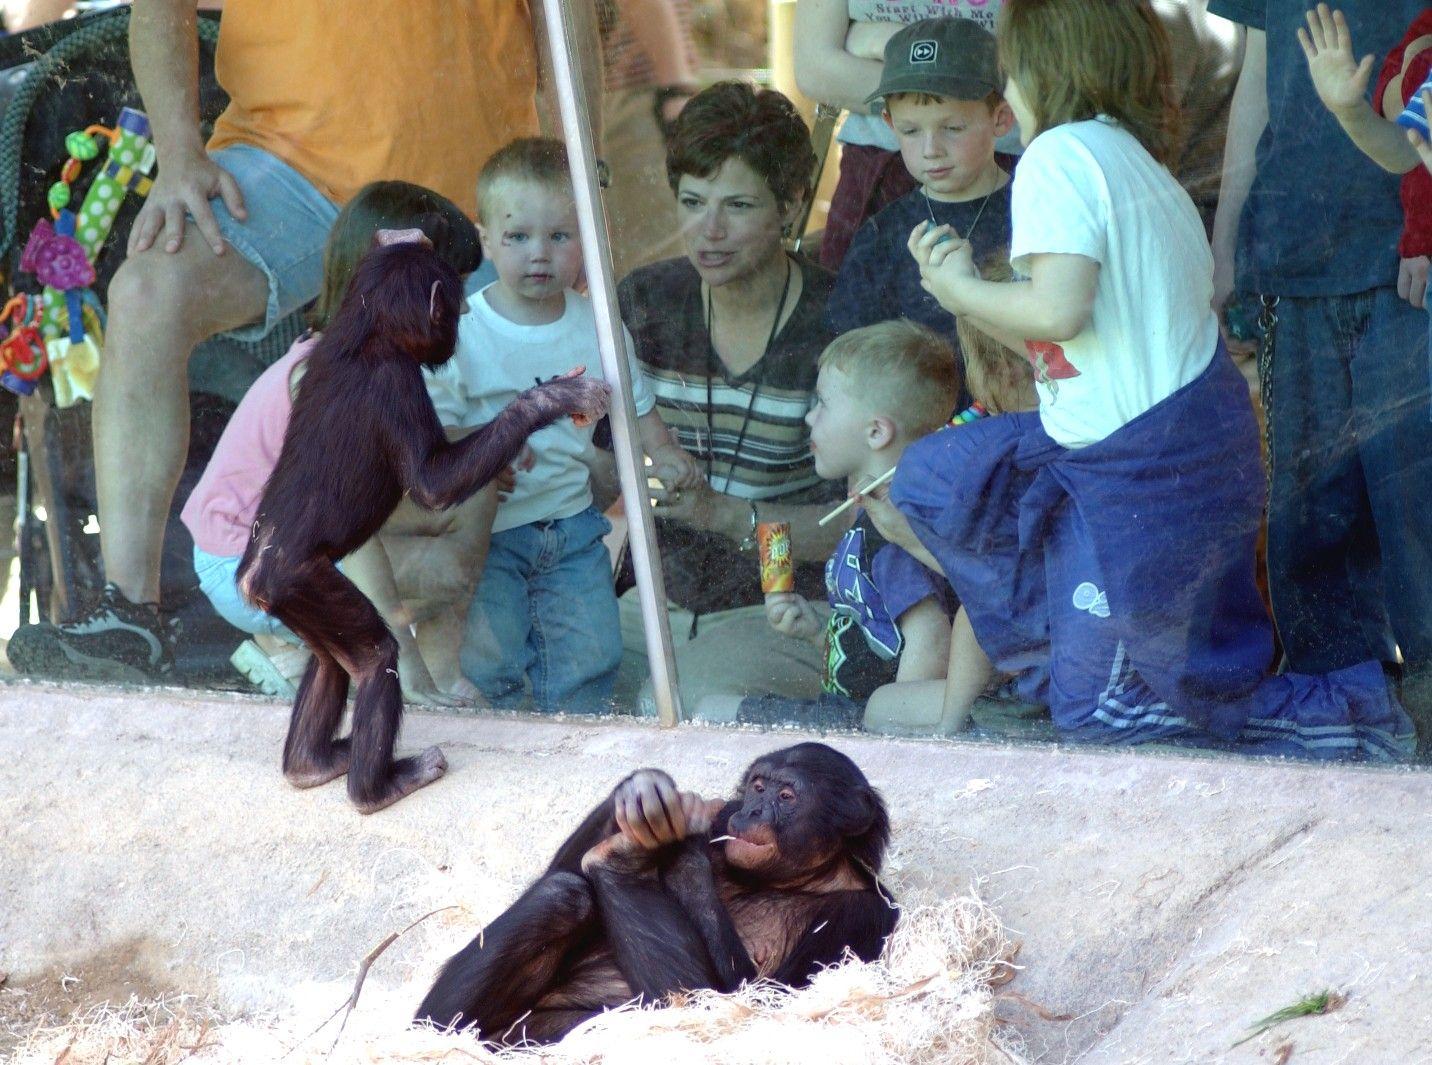 A family enjoys observing the baby bonobos